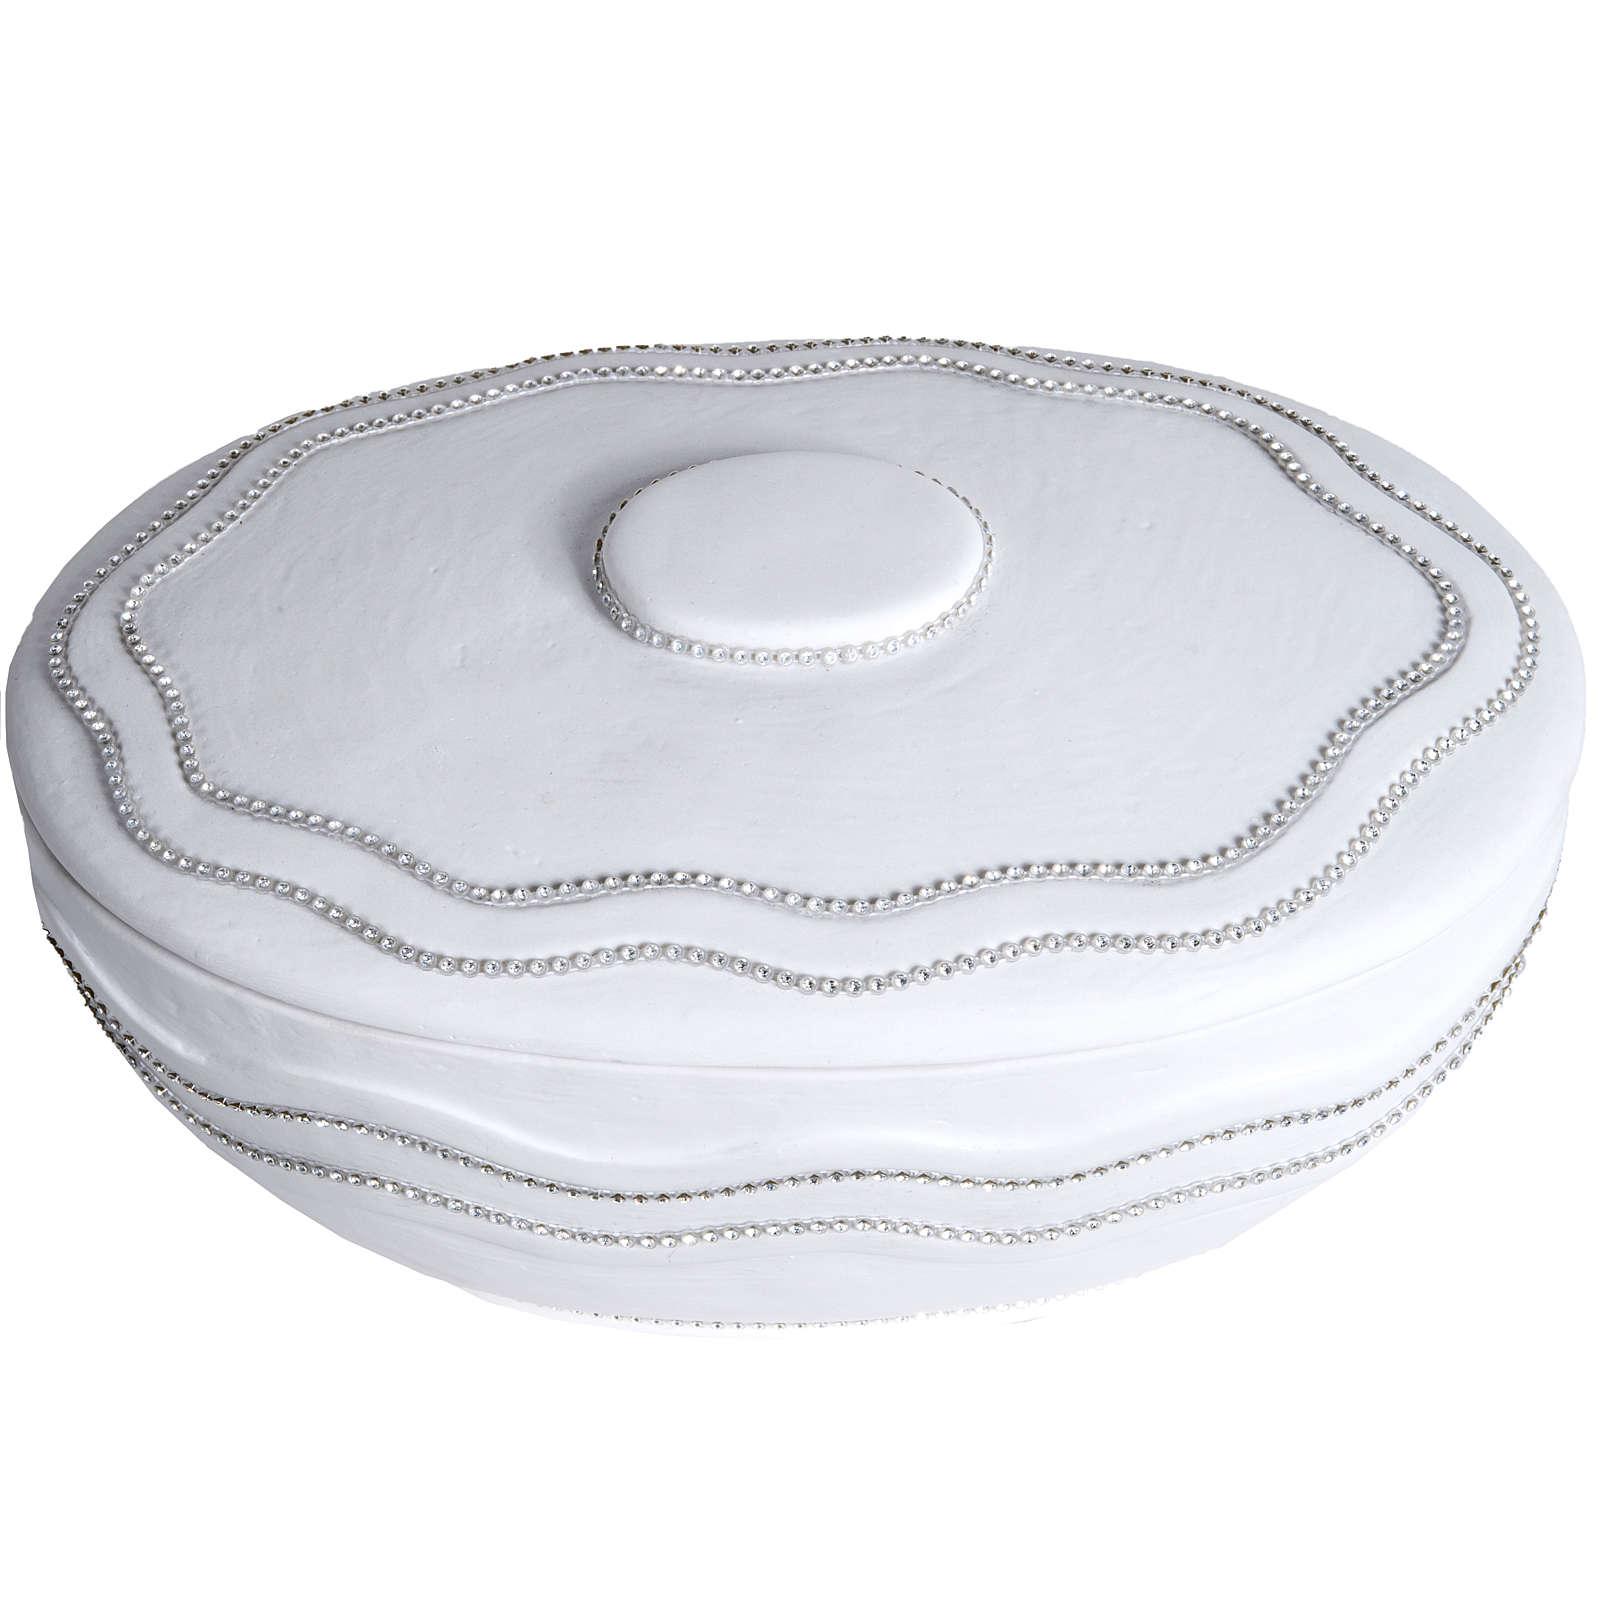 Urna cineraria tonda marmo sintetico bianca fili Swarovski 3